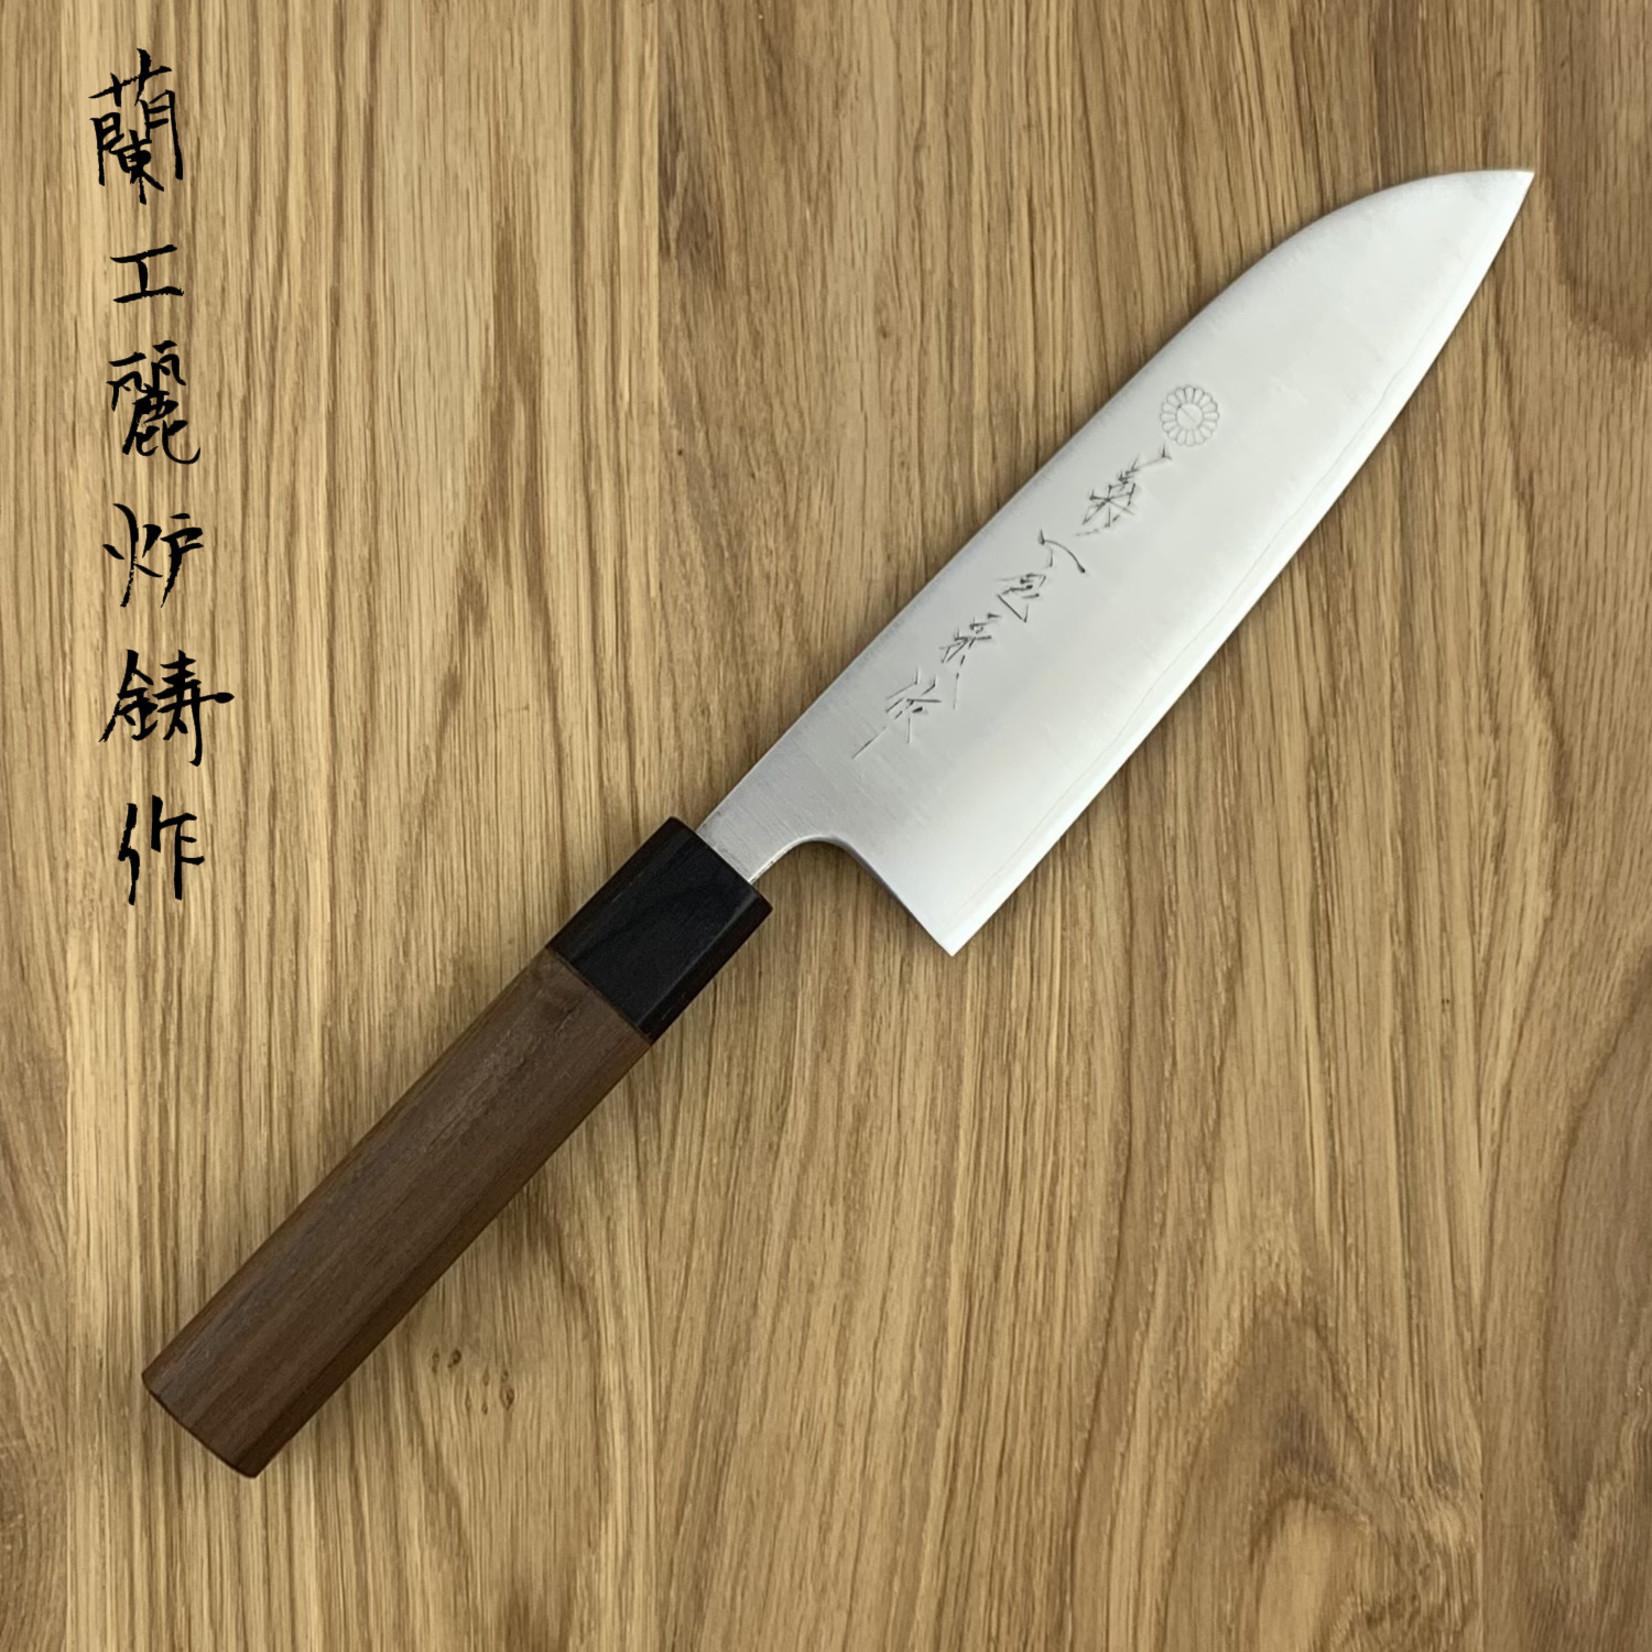 KIKUICHI Ginsan Sanmai Walnut Handle Santoku 165mm